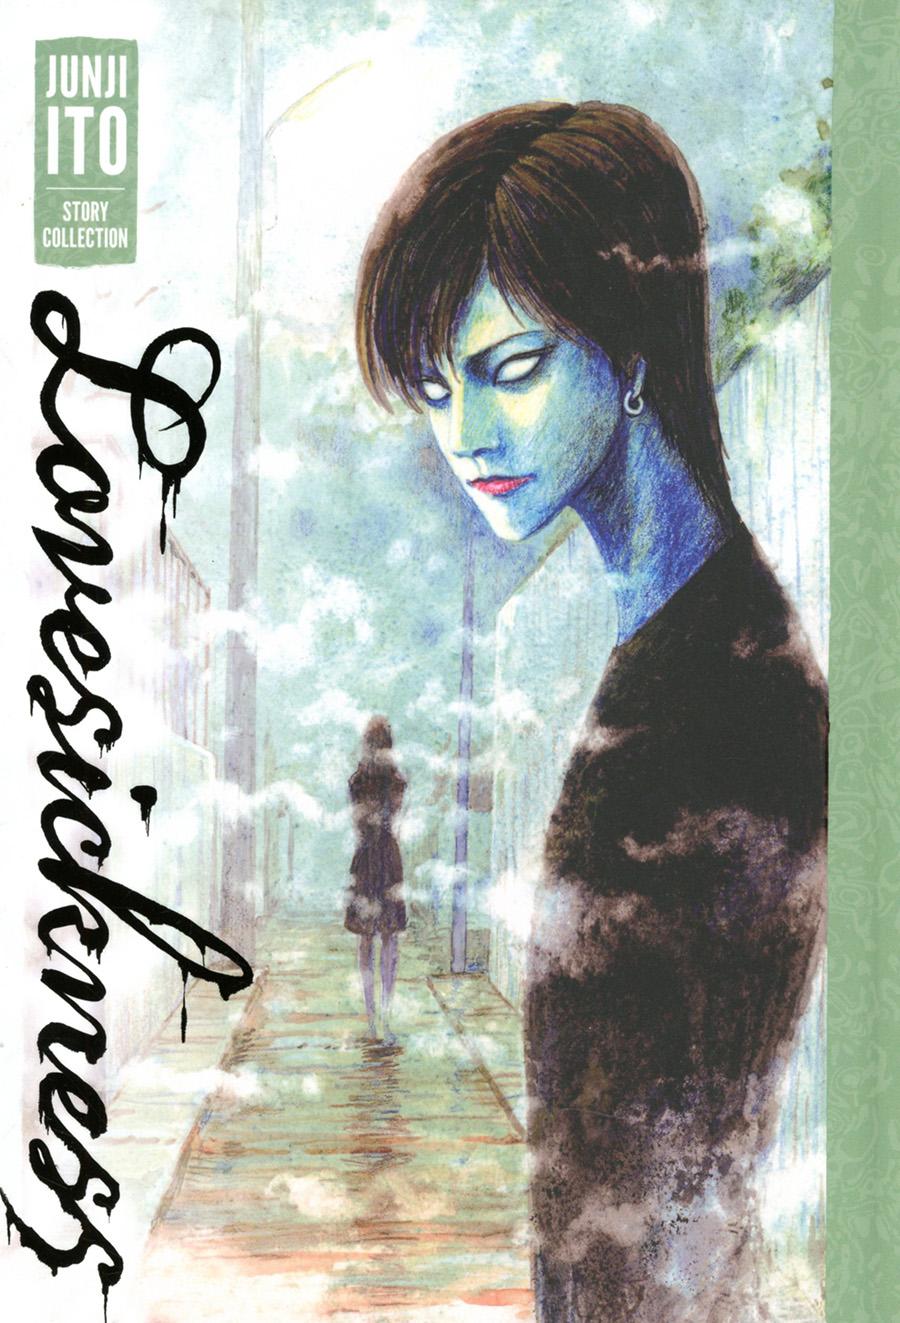 Junji Ito Story Collection Lovesickness HC